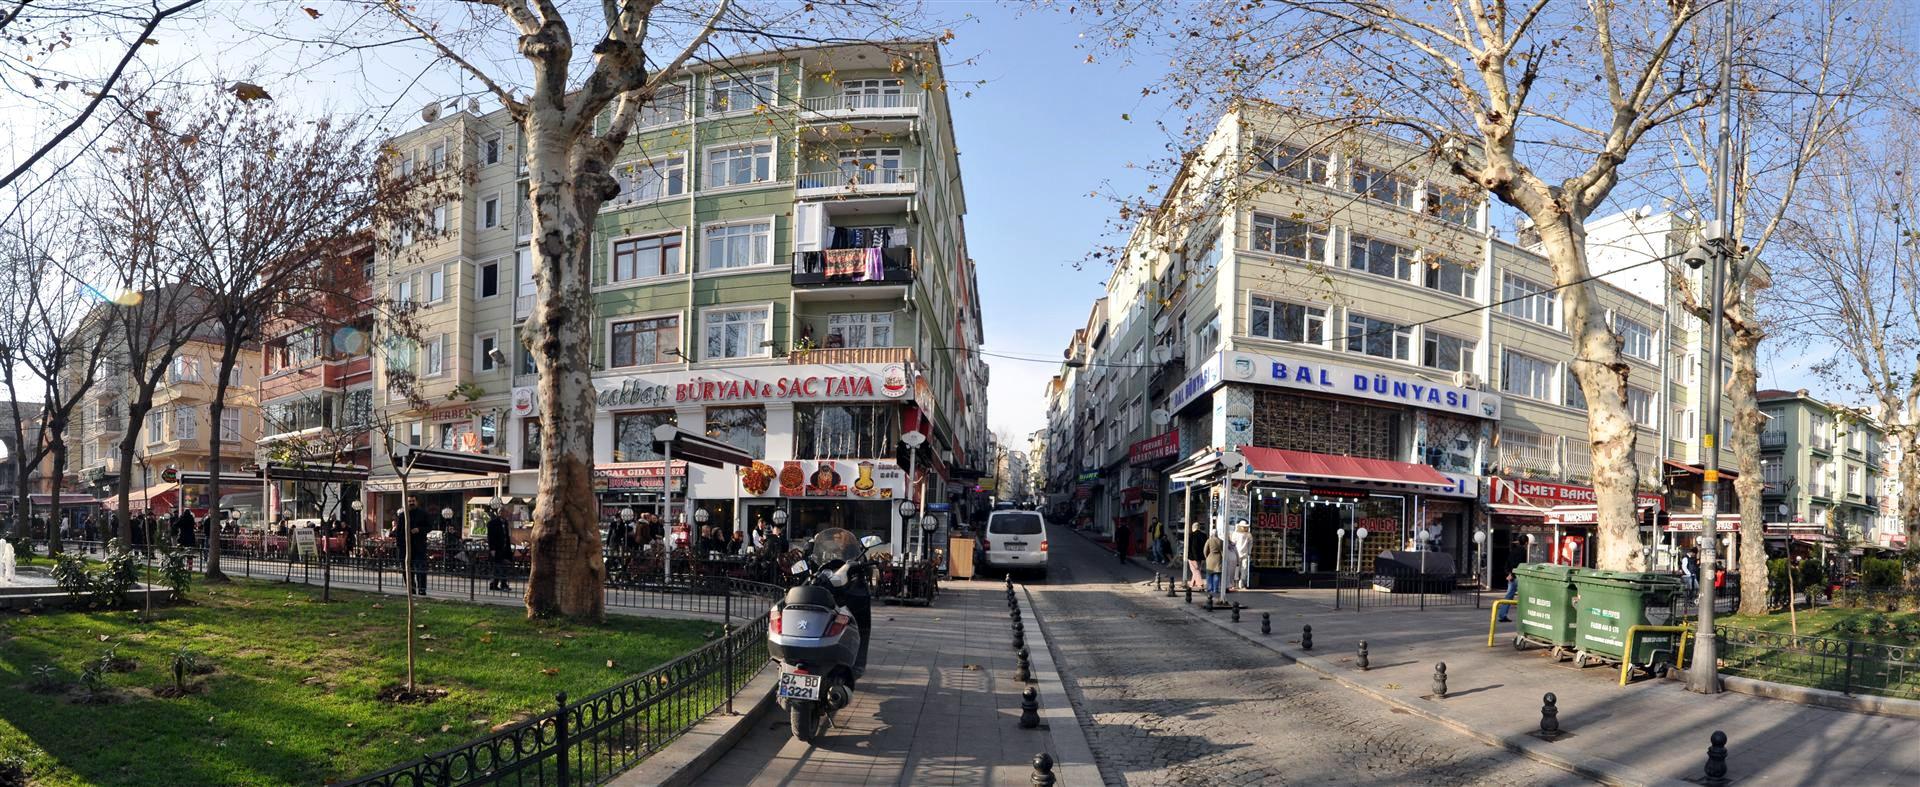 Fatih streets